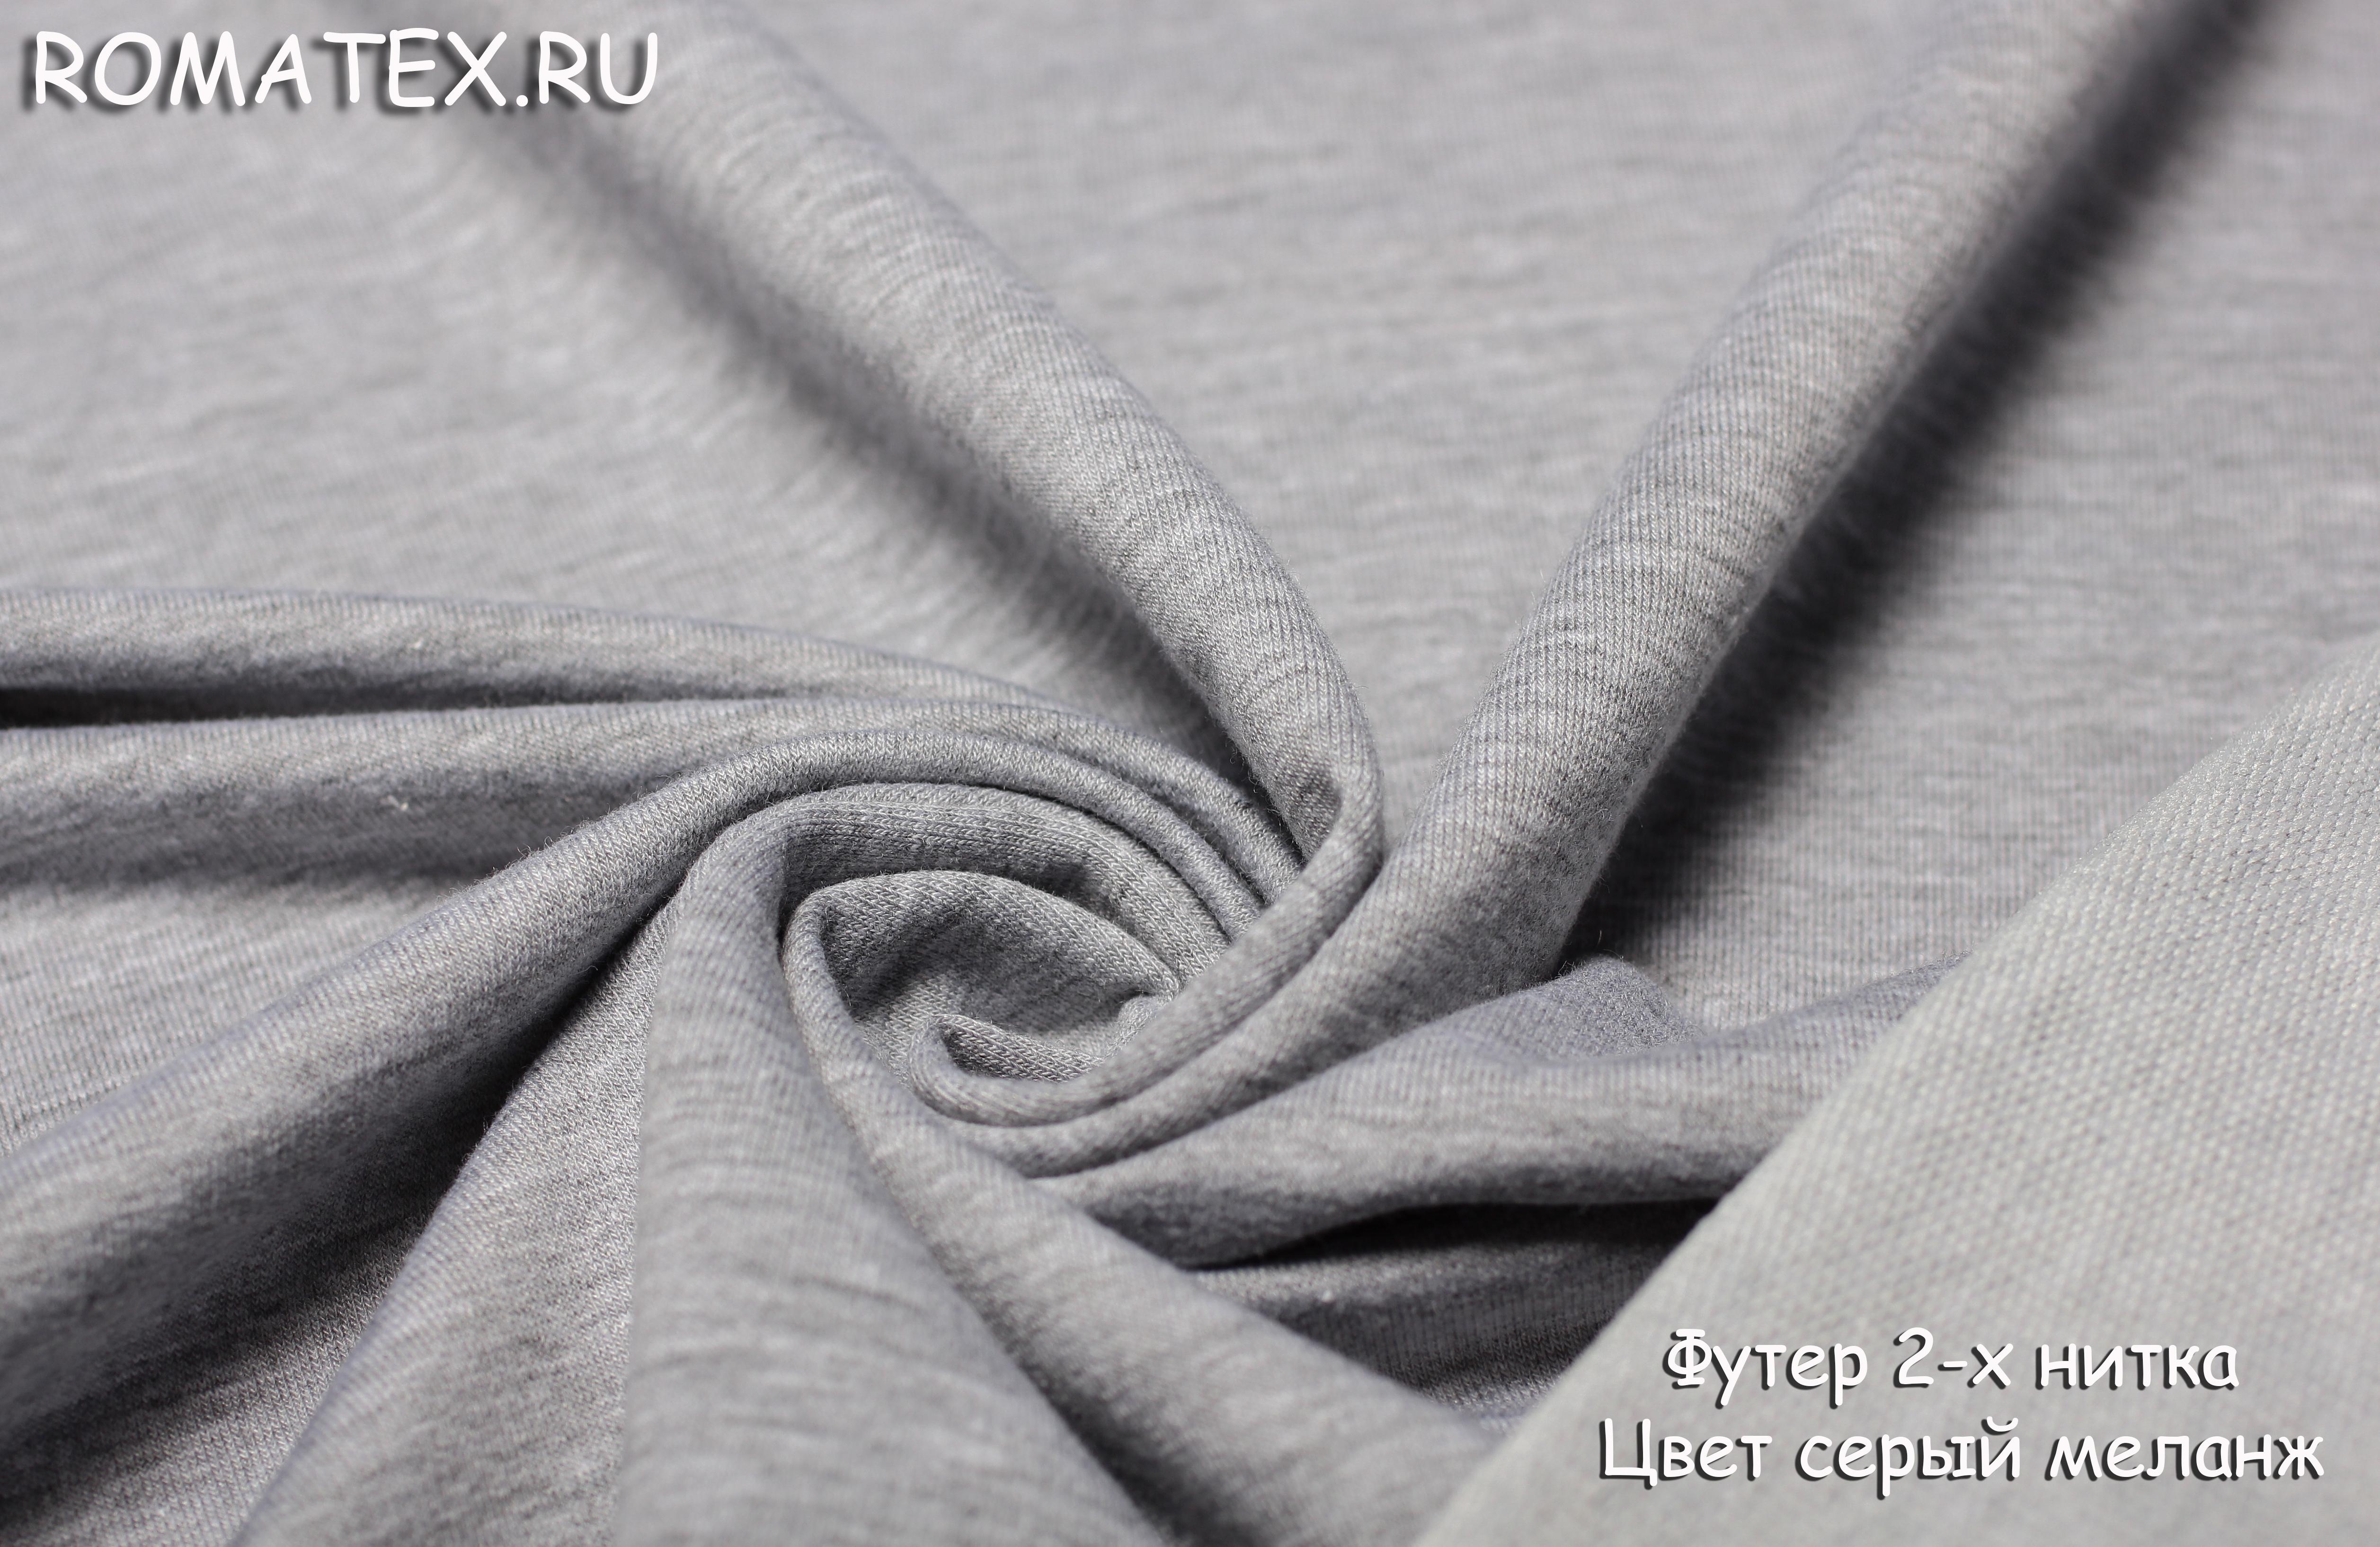 Футер 2-х нитка цвет серый меланж